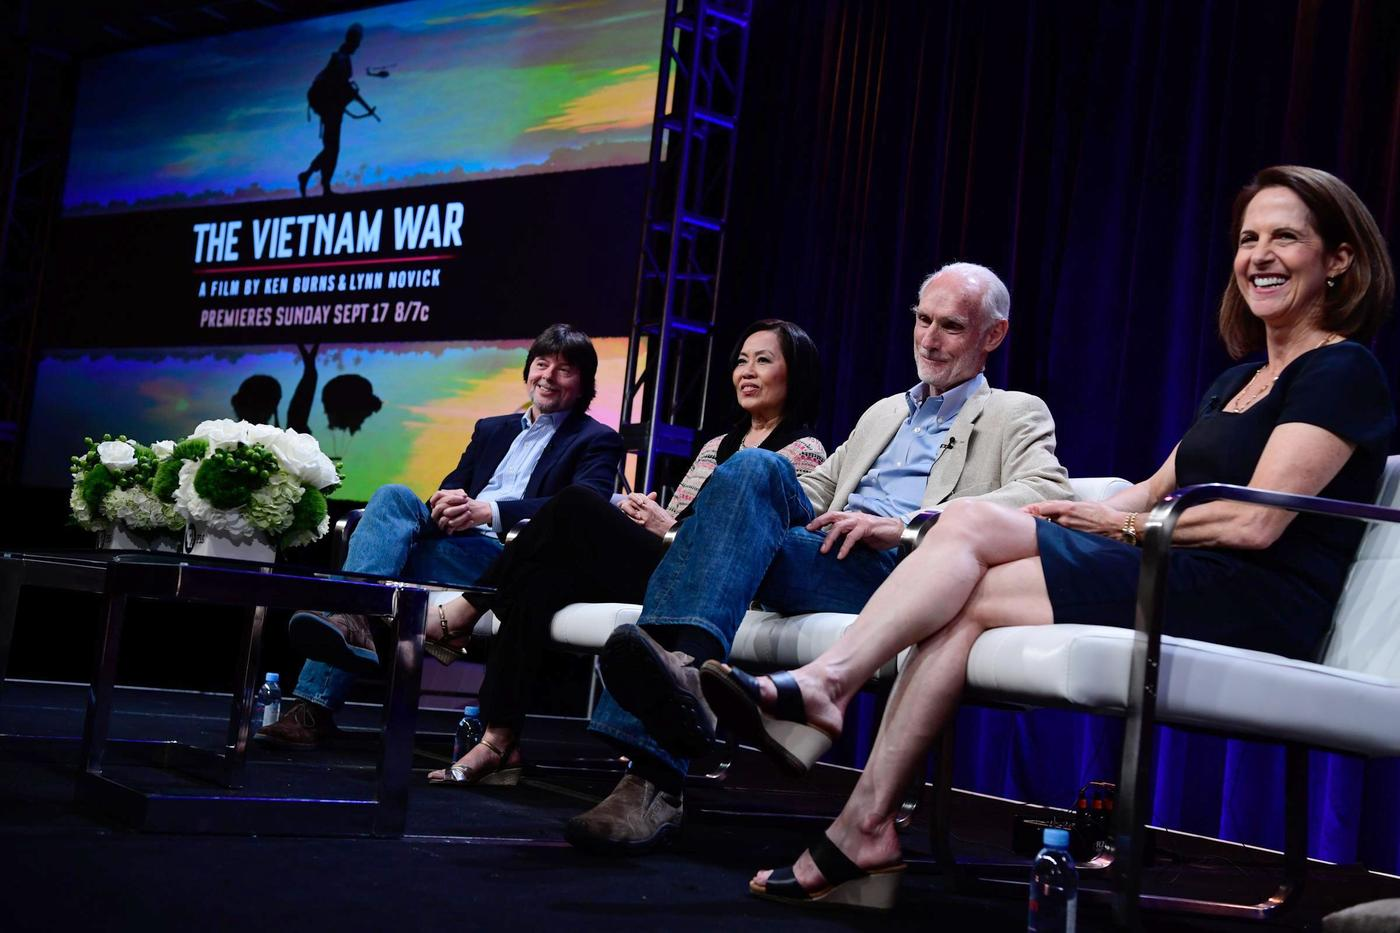 "Filmmakers Ken Burns (far left) and Lynn Novick (far right) discuss their Vietnam War documentary at a TV critics event in July. Photo: Rahoul Ghose, PBS. """